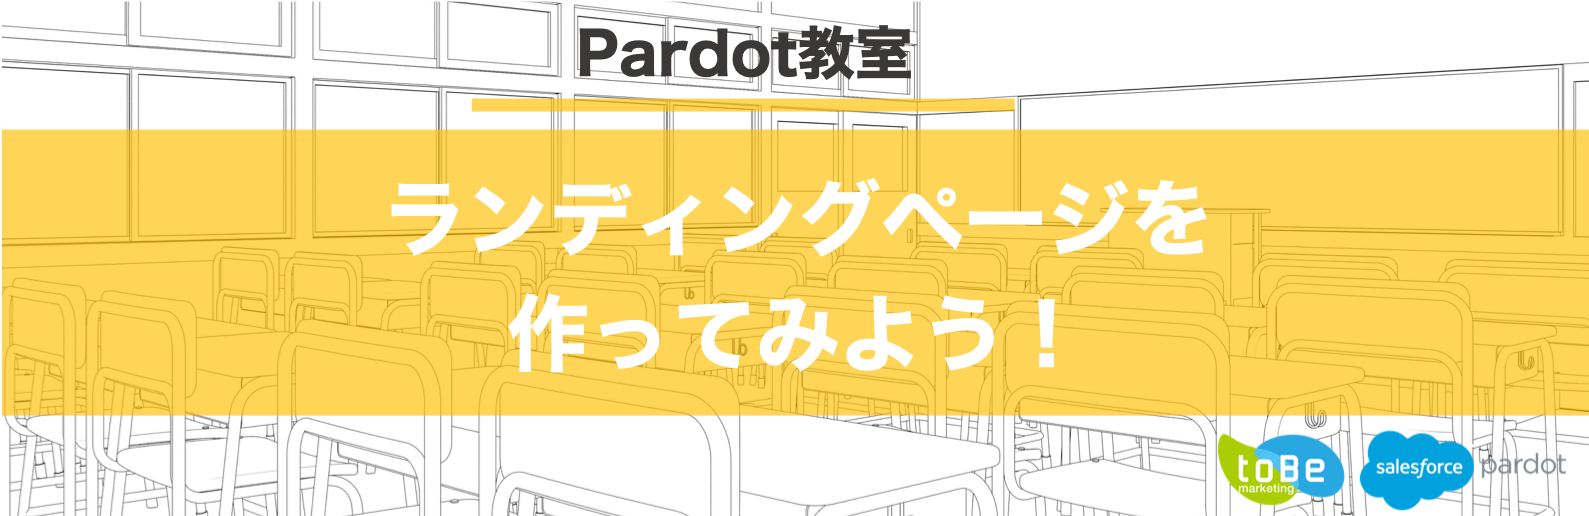 【Pardot教室 】ランディングページを作ってみよう!